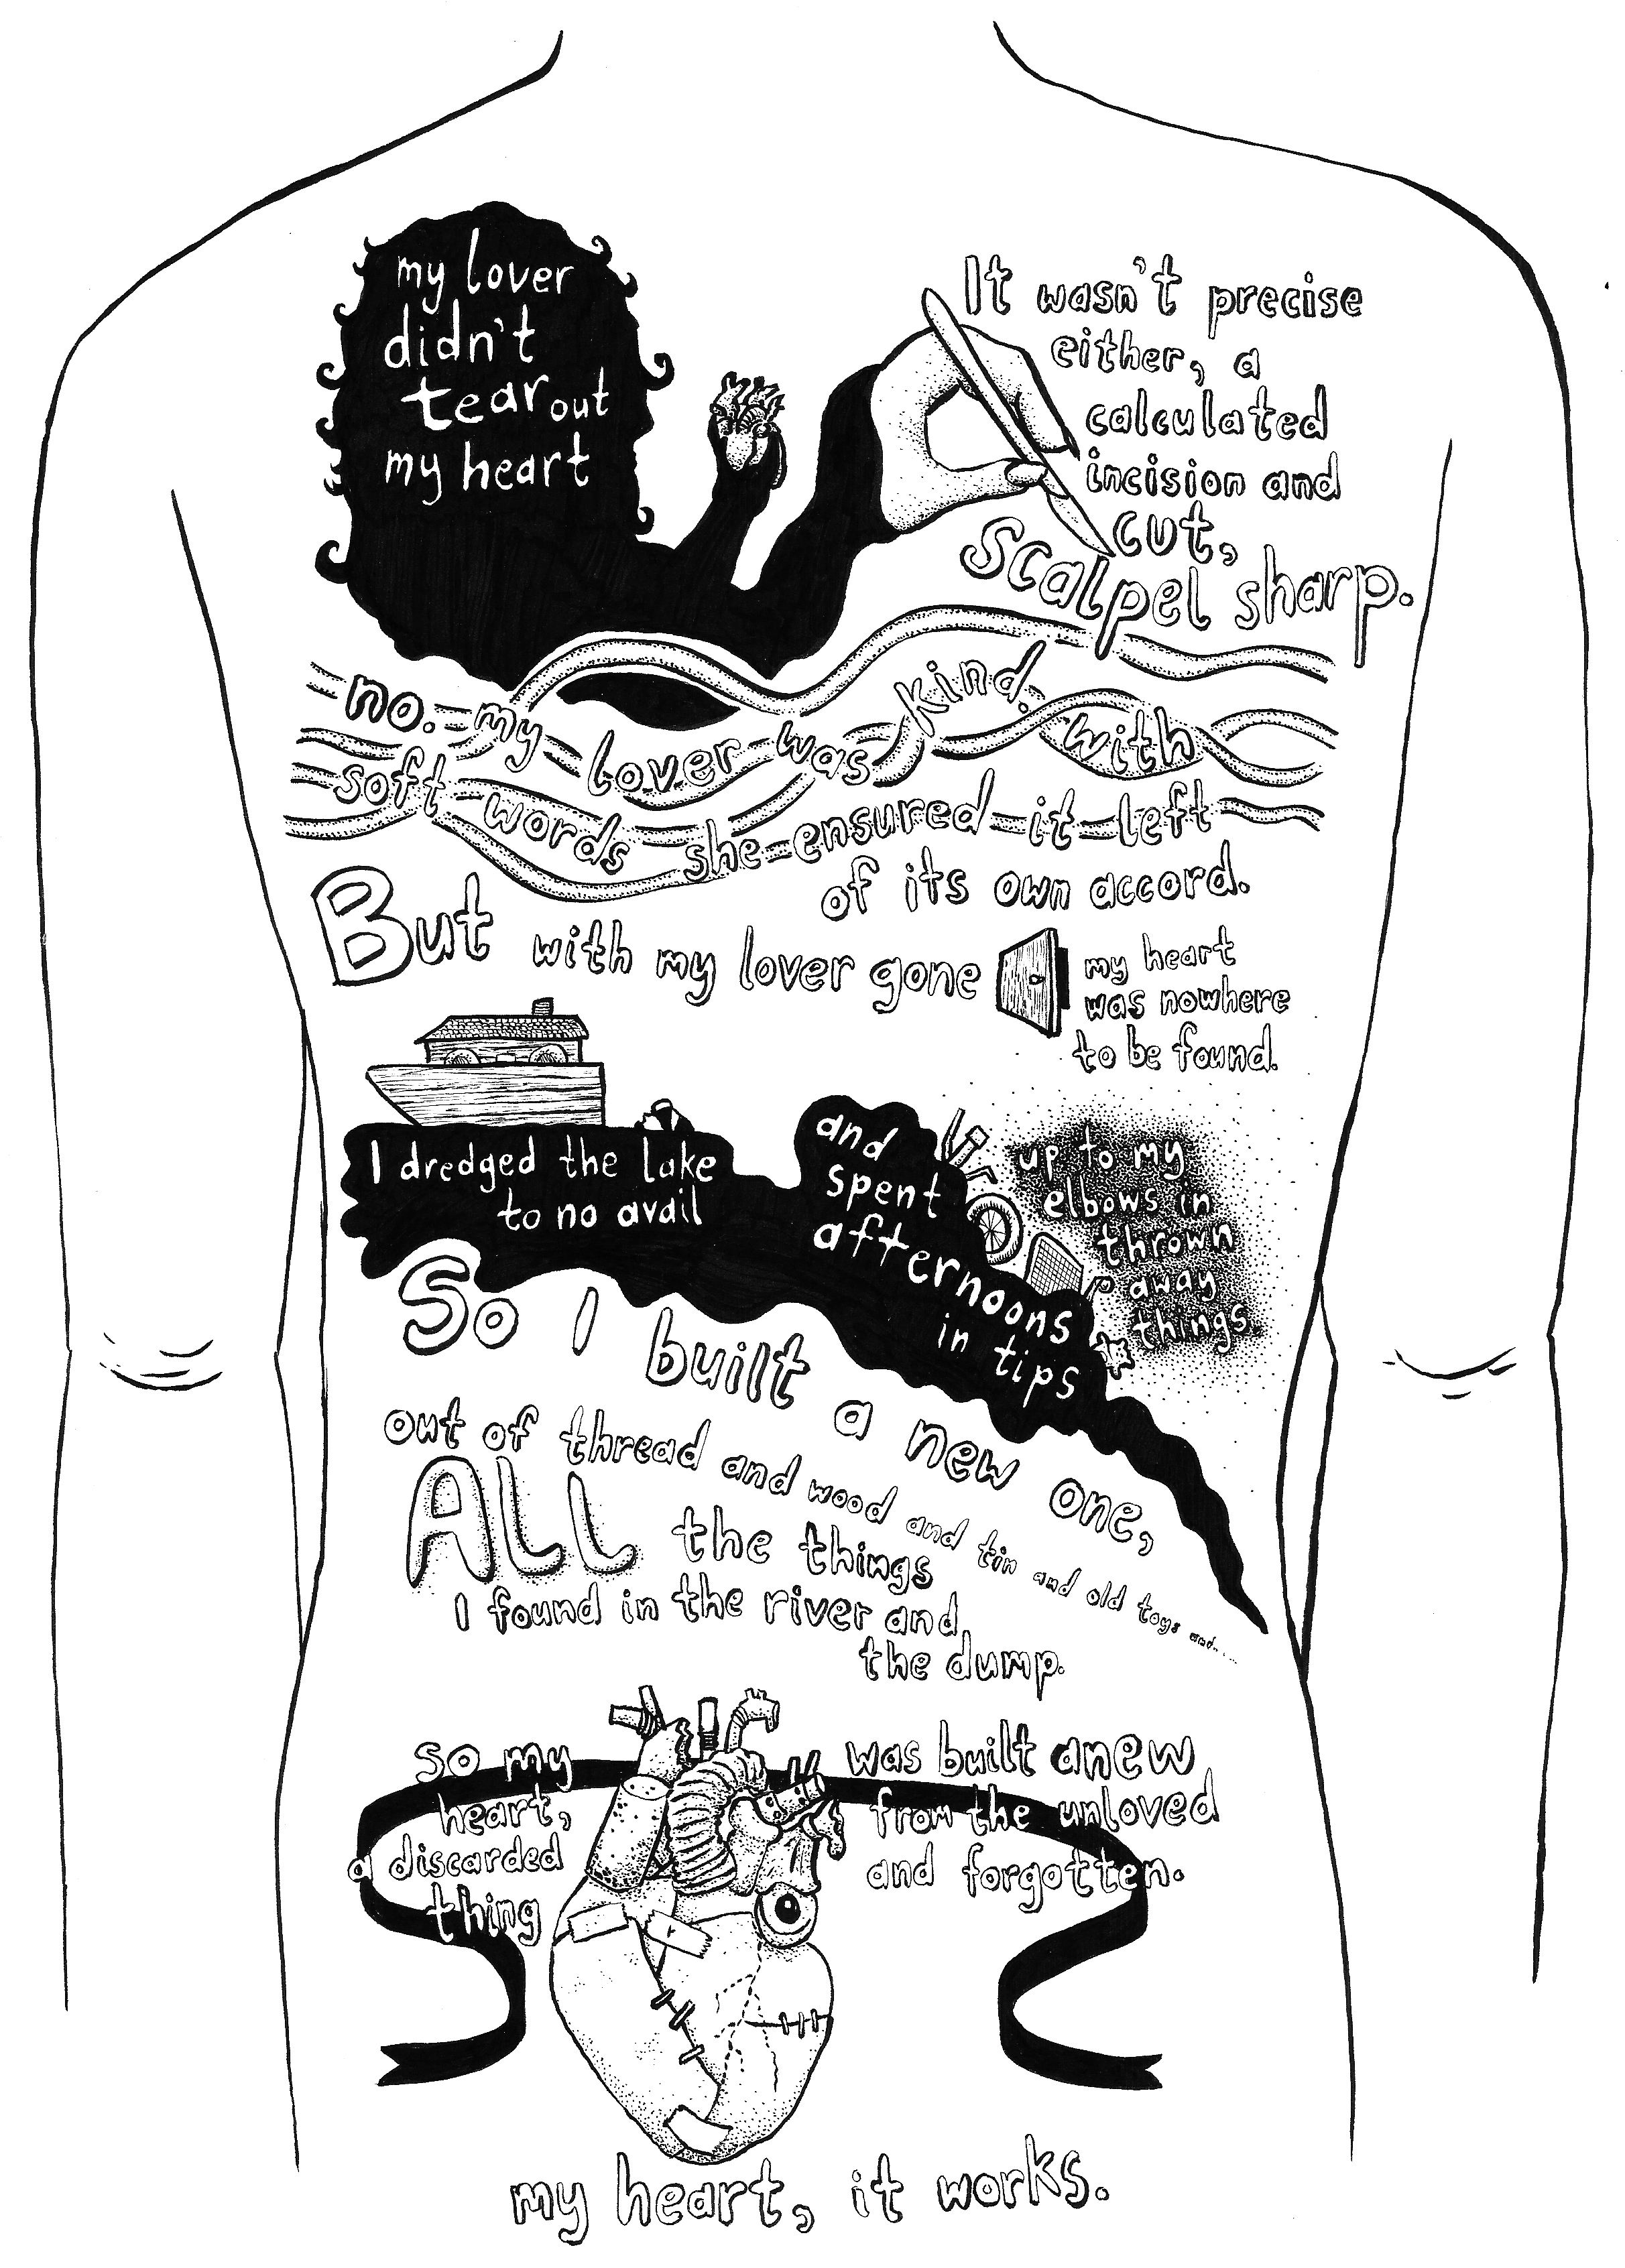 COMICS - Narrative-based illustration